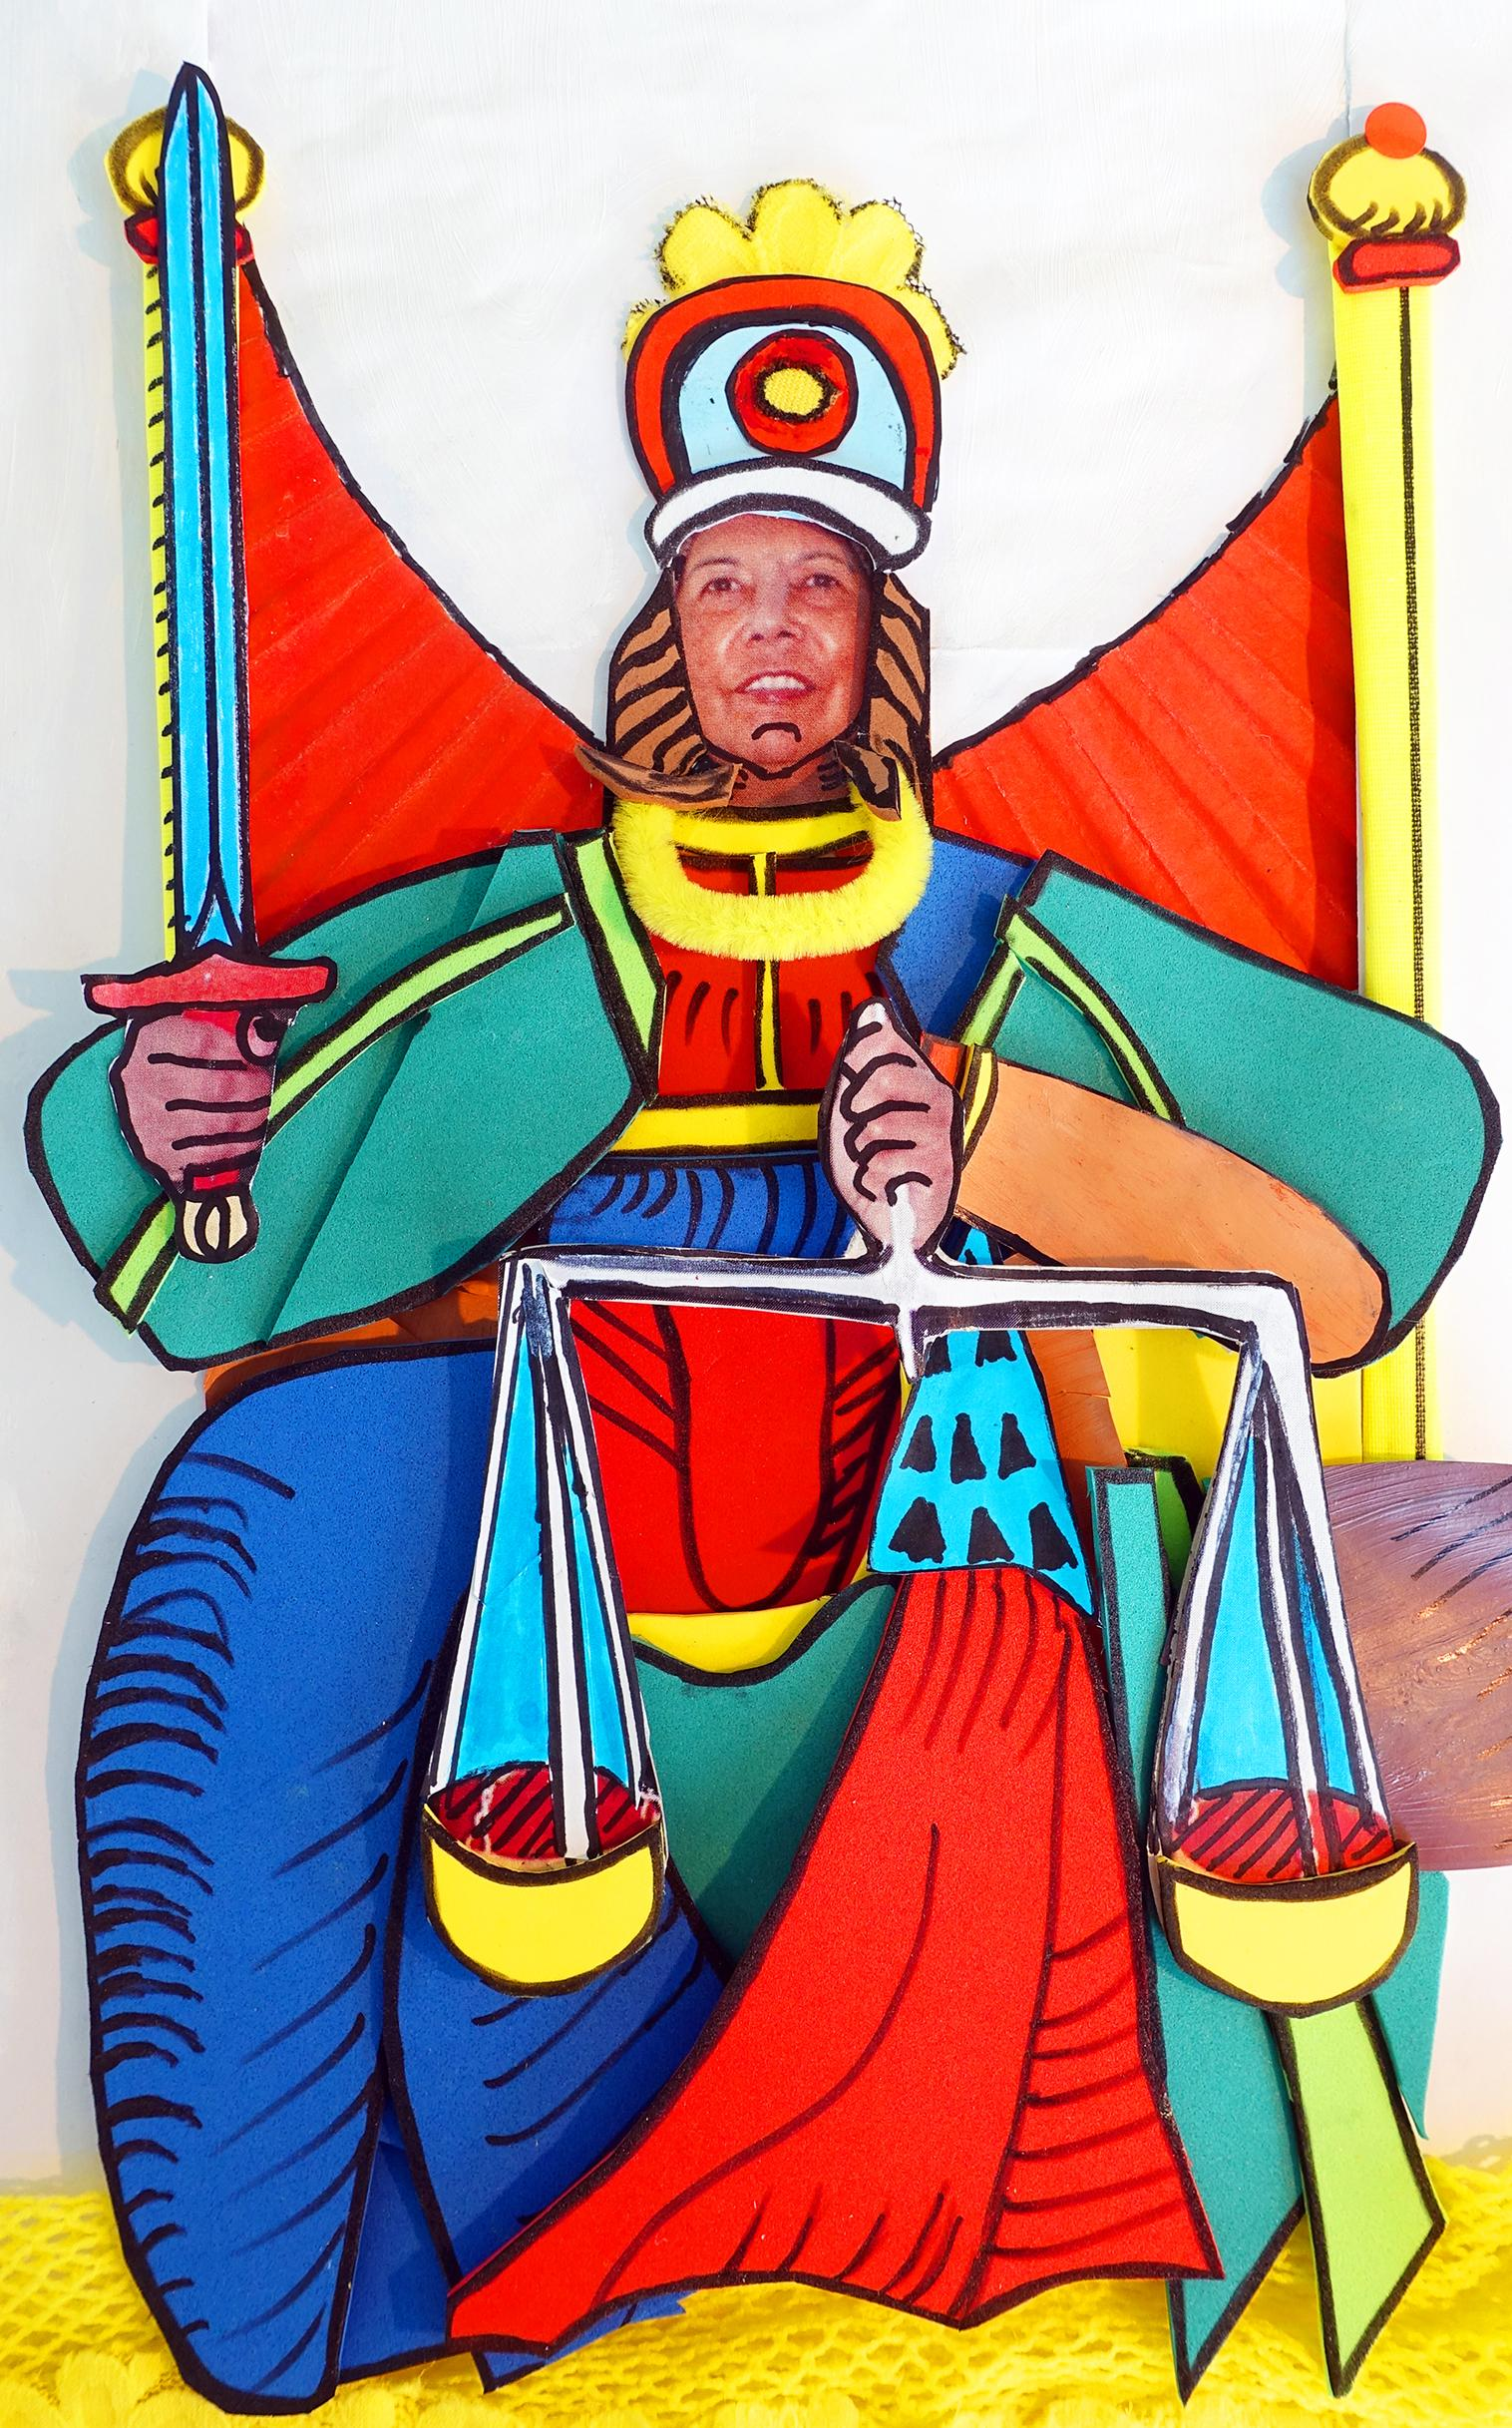 VIII LA JUSTICIA, leyla rodriguez, waldhorn, boom, the separation loop, supreme presence